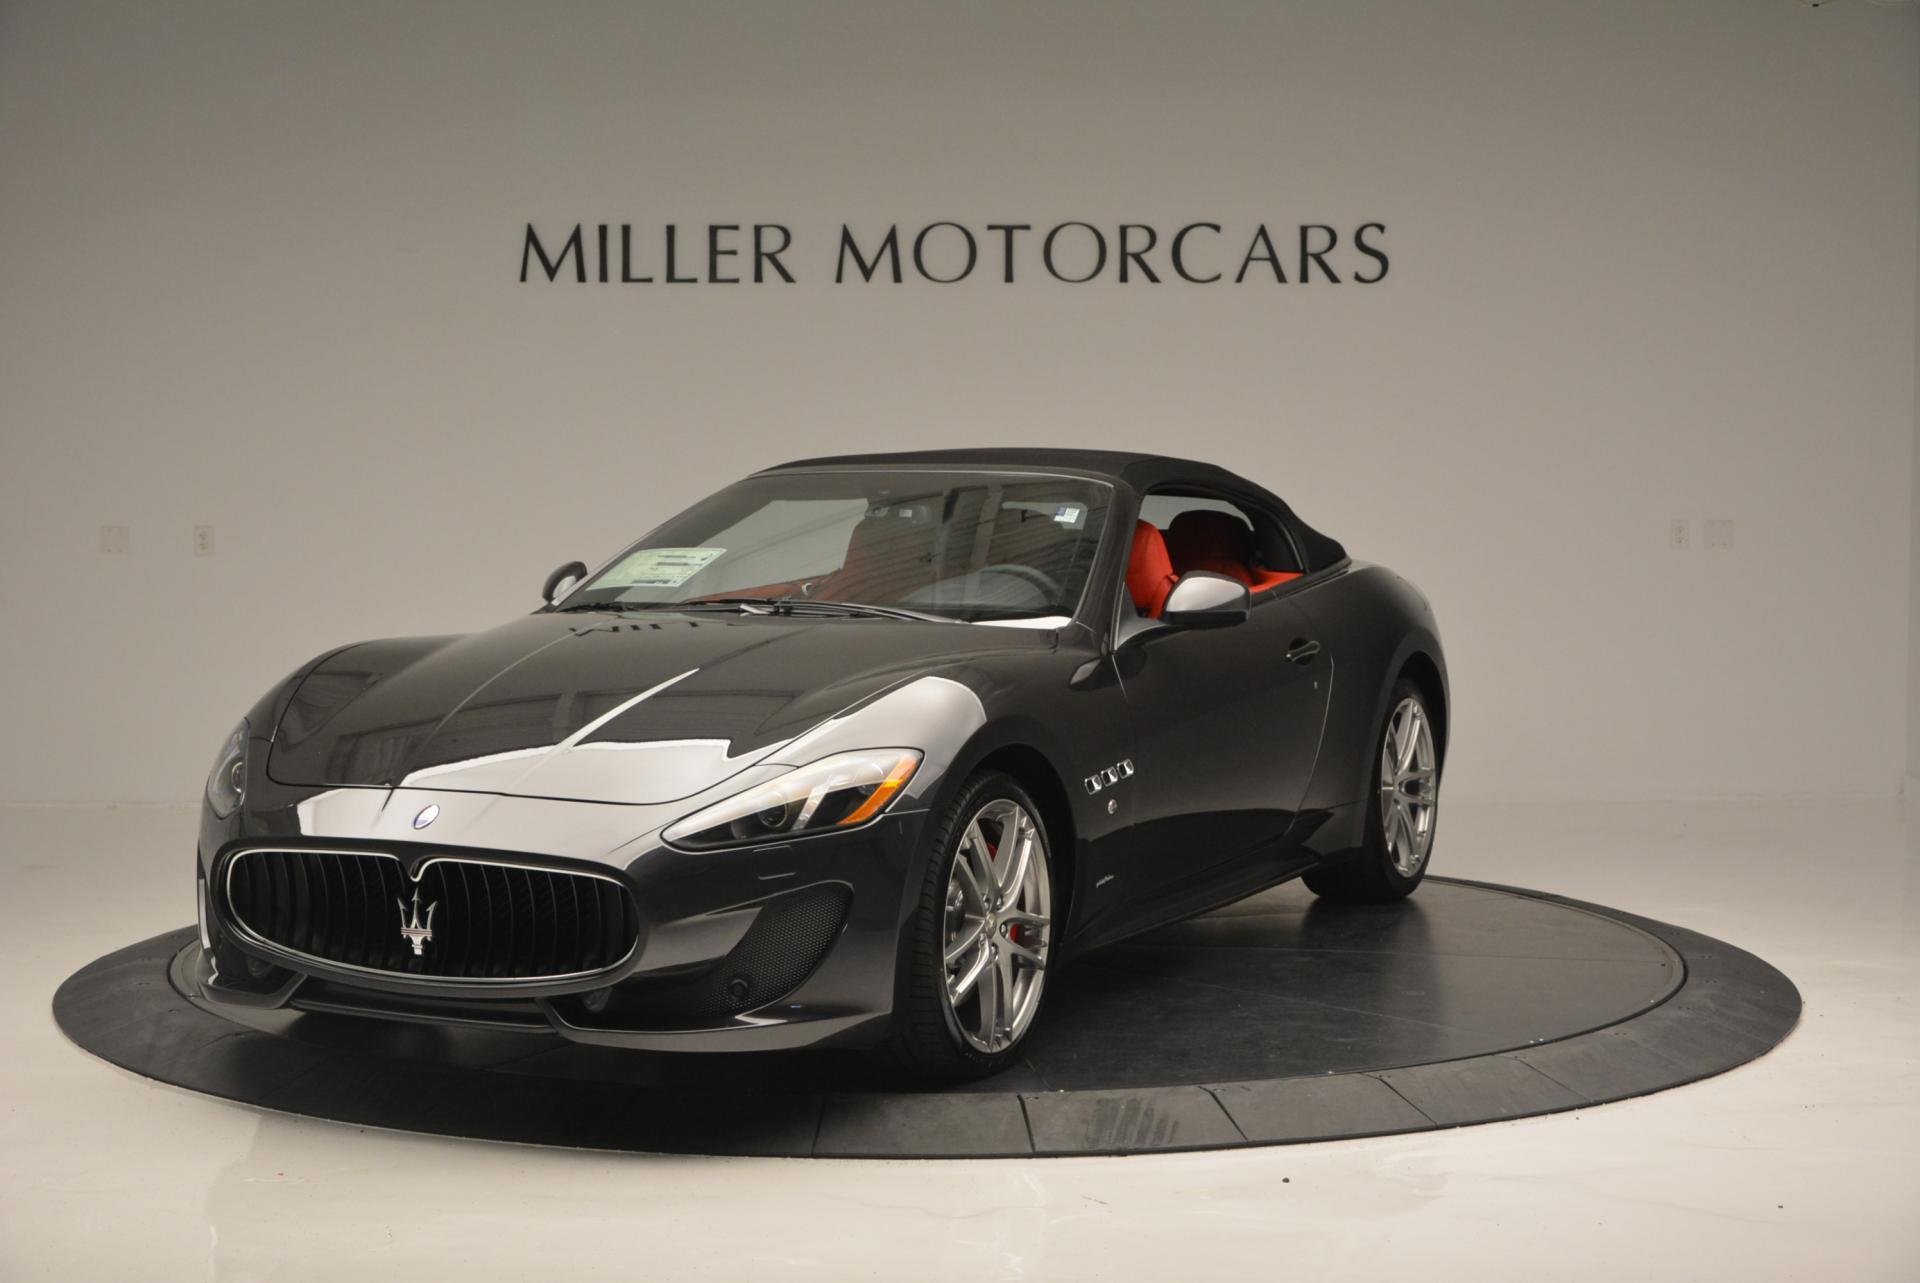 New 2017 Maserati GranTurismo Convertible Sport For Sale In Westport, CT 156_p2